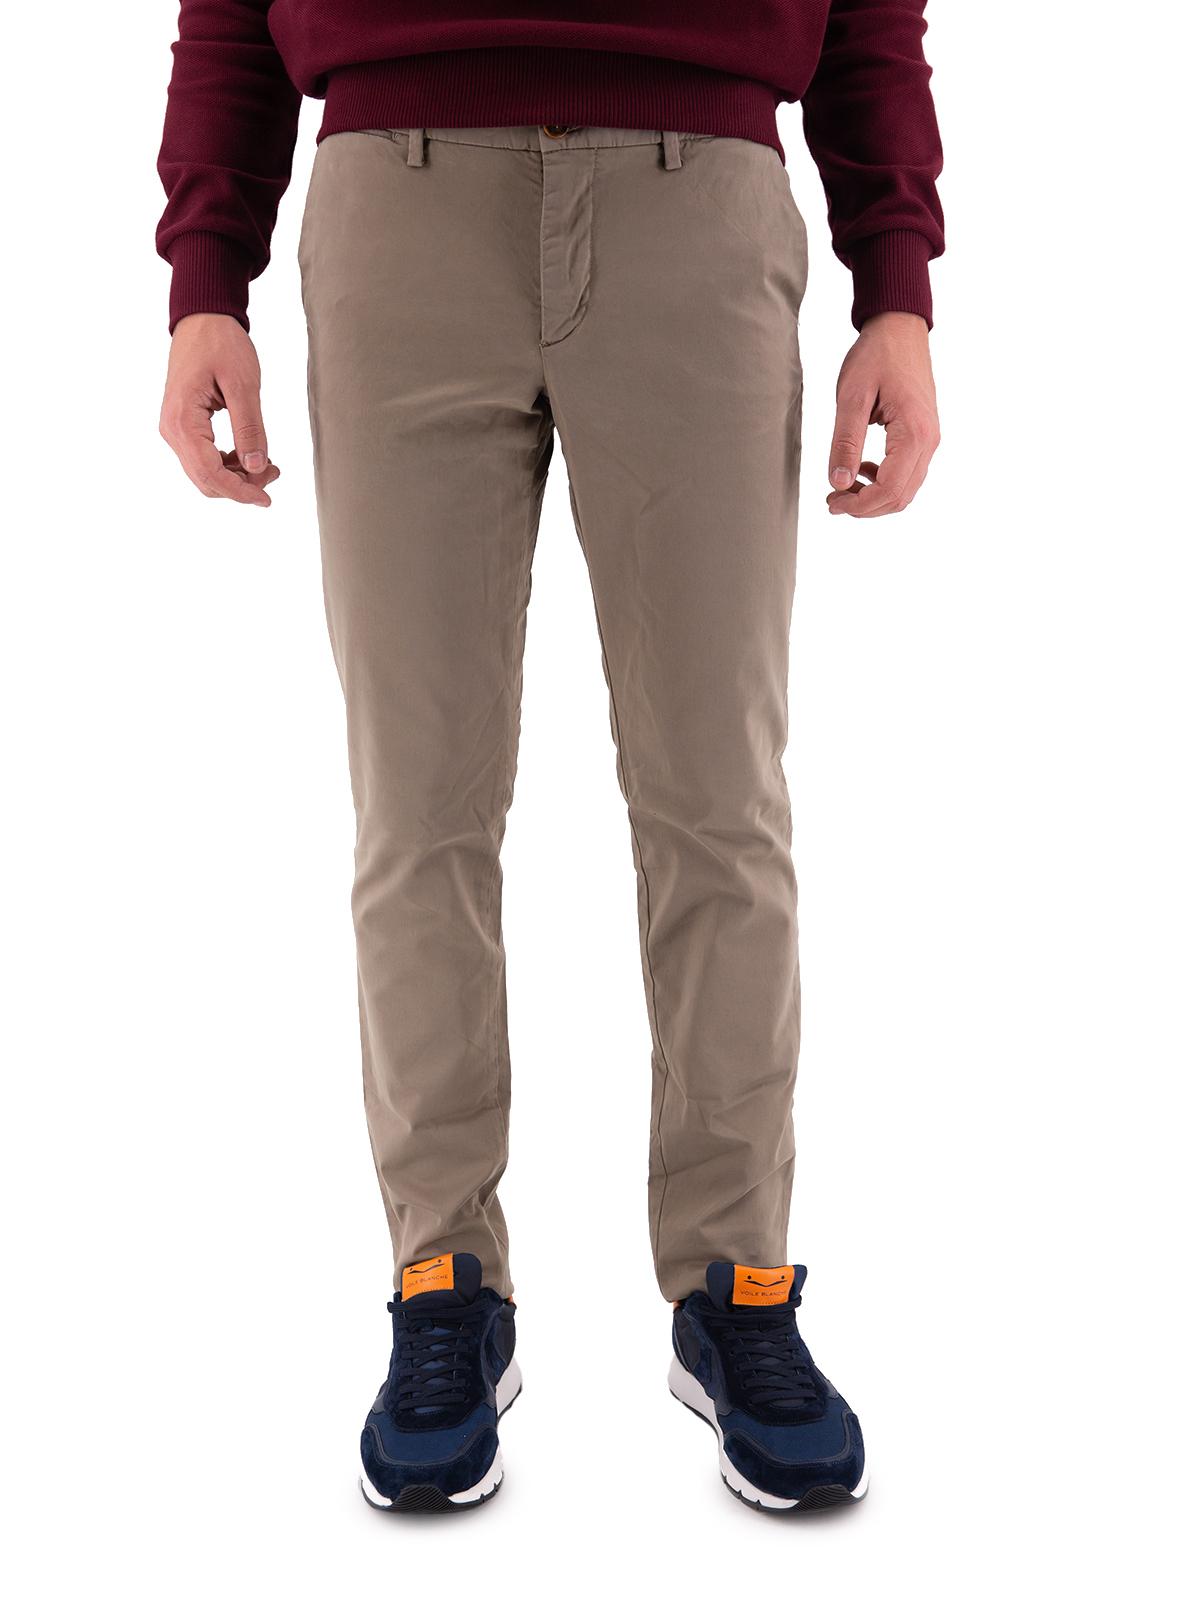 Trussardi Pantalone 52P00000 1T003136 H001